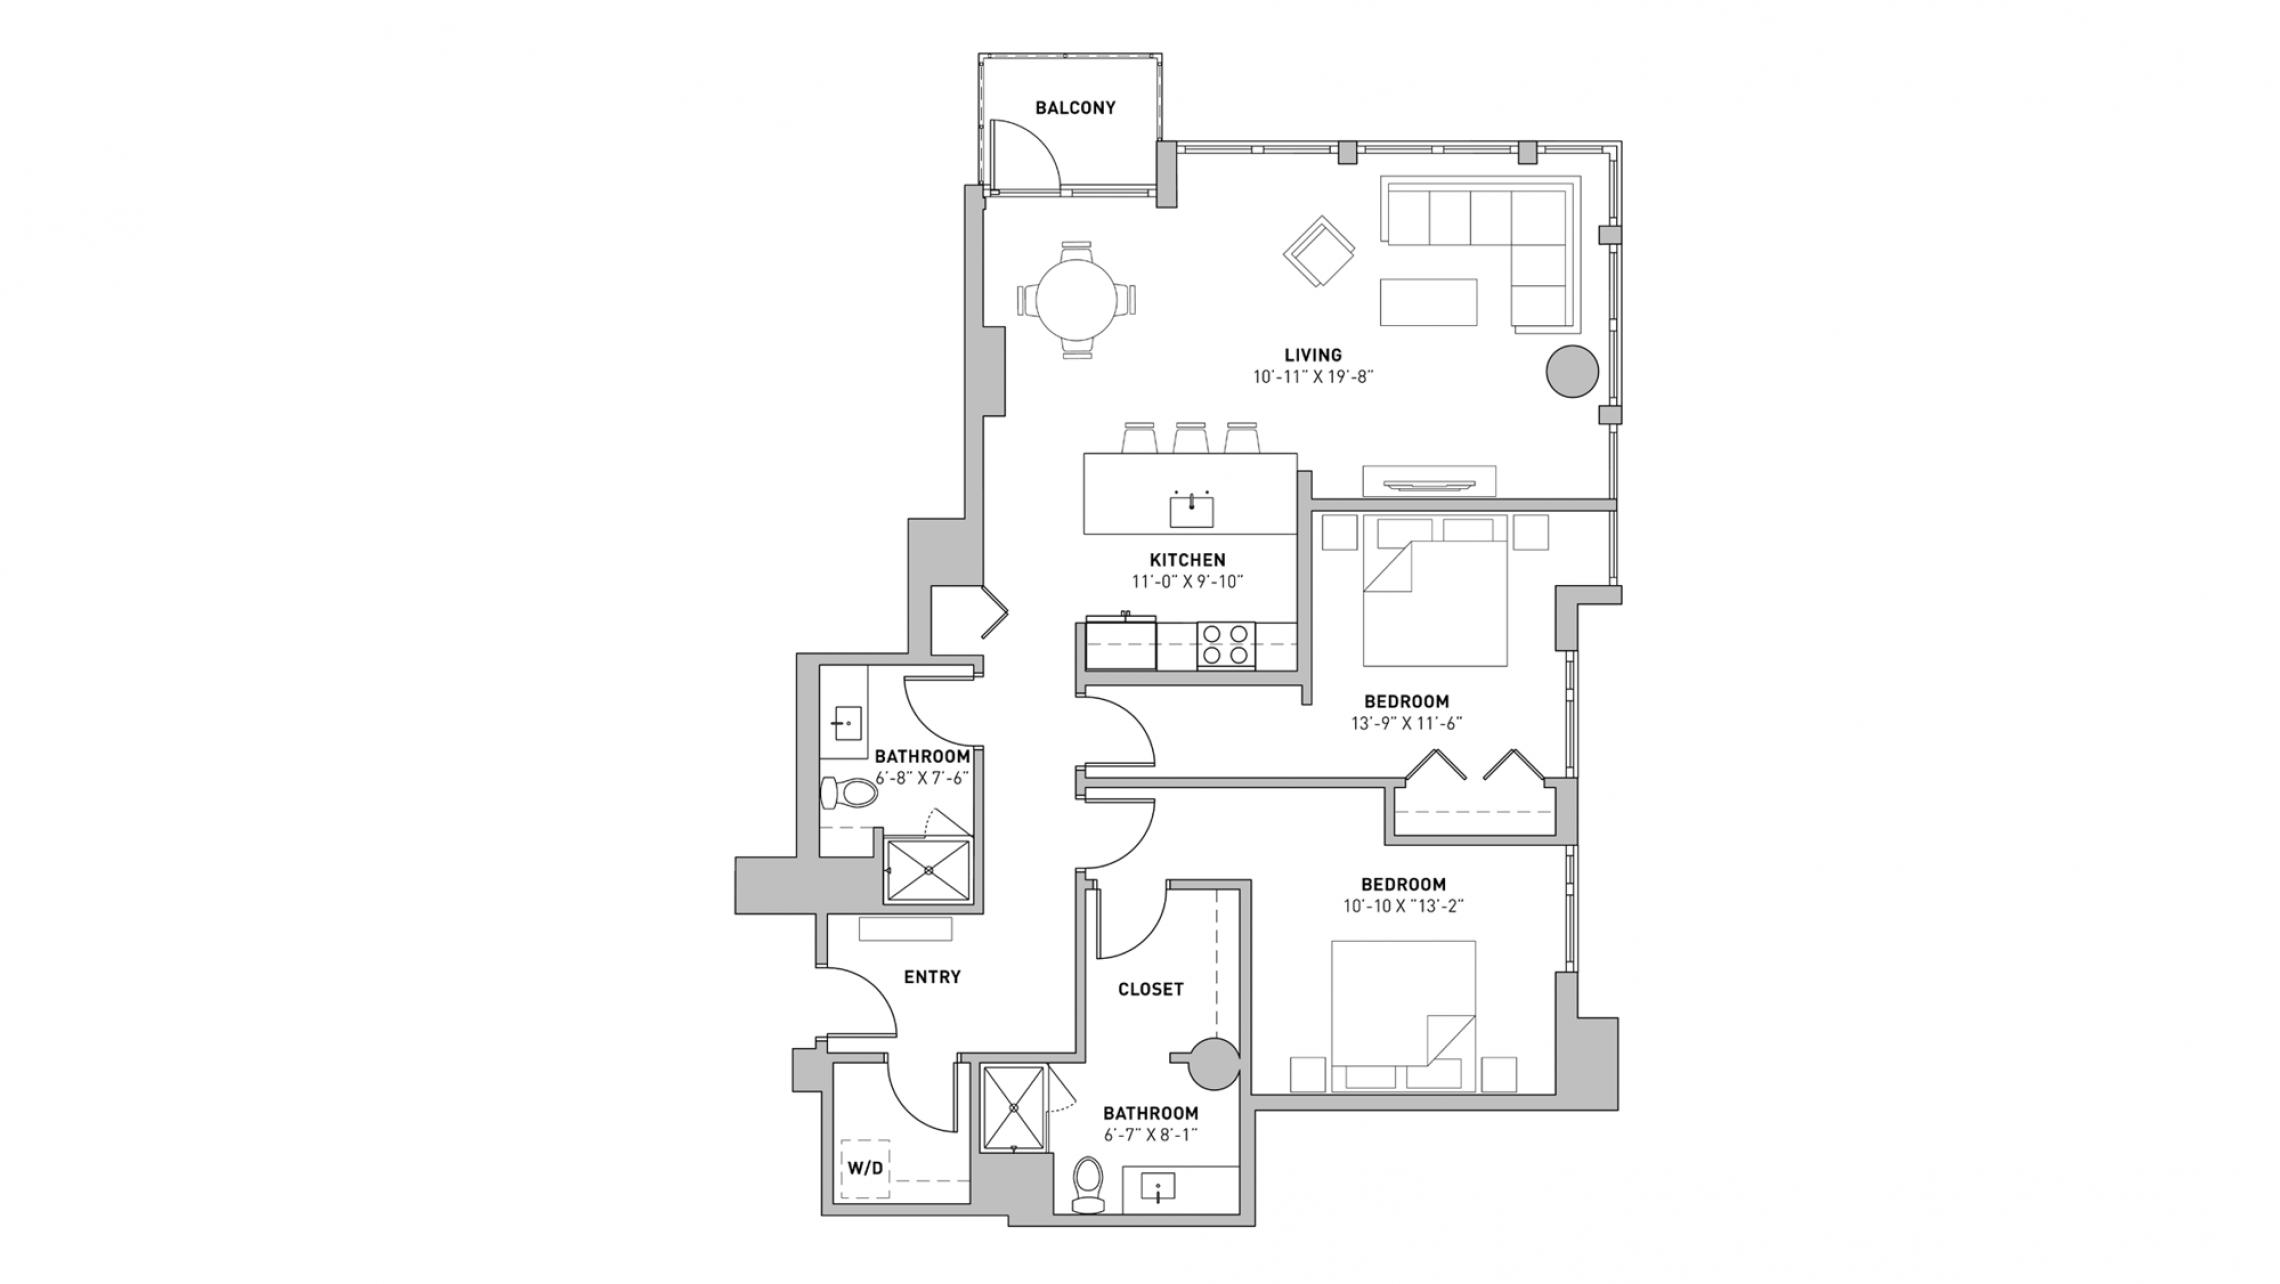 ULI The Pressman 407 - Two Bedroom, Two Bathroom